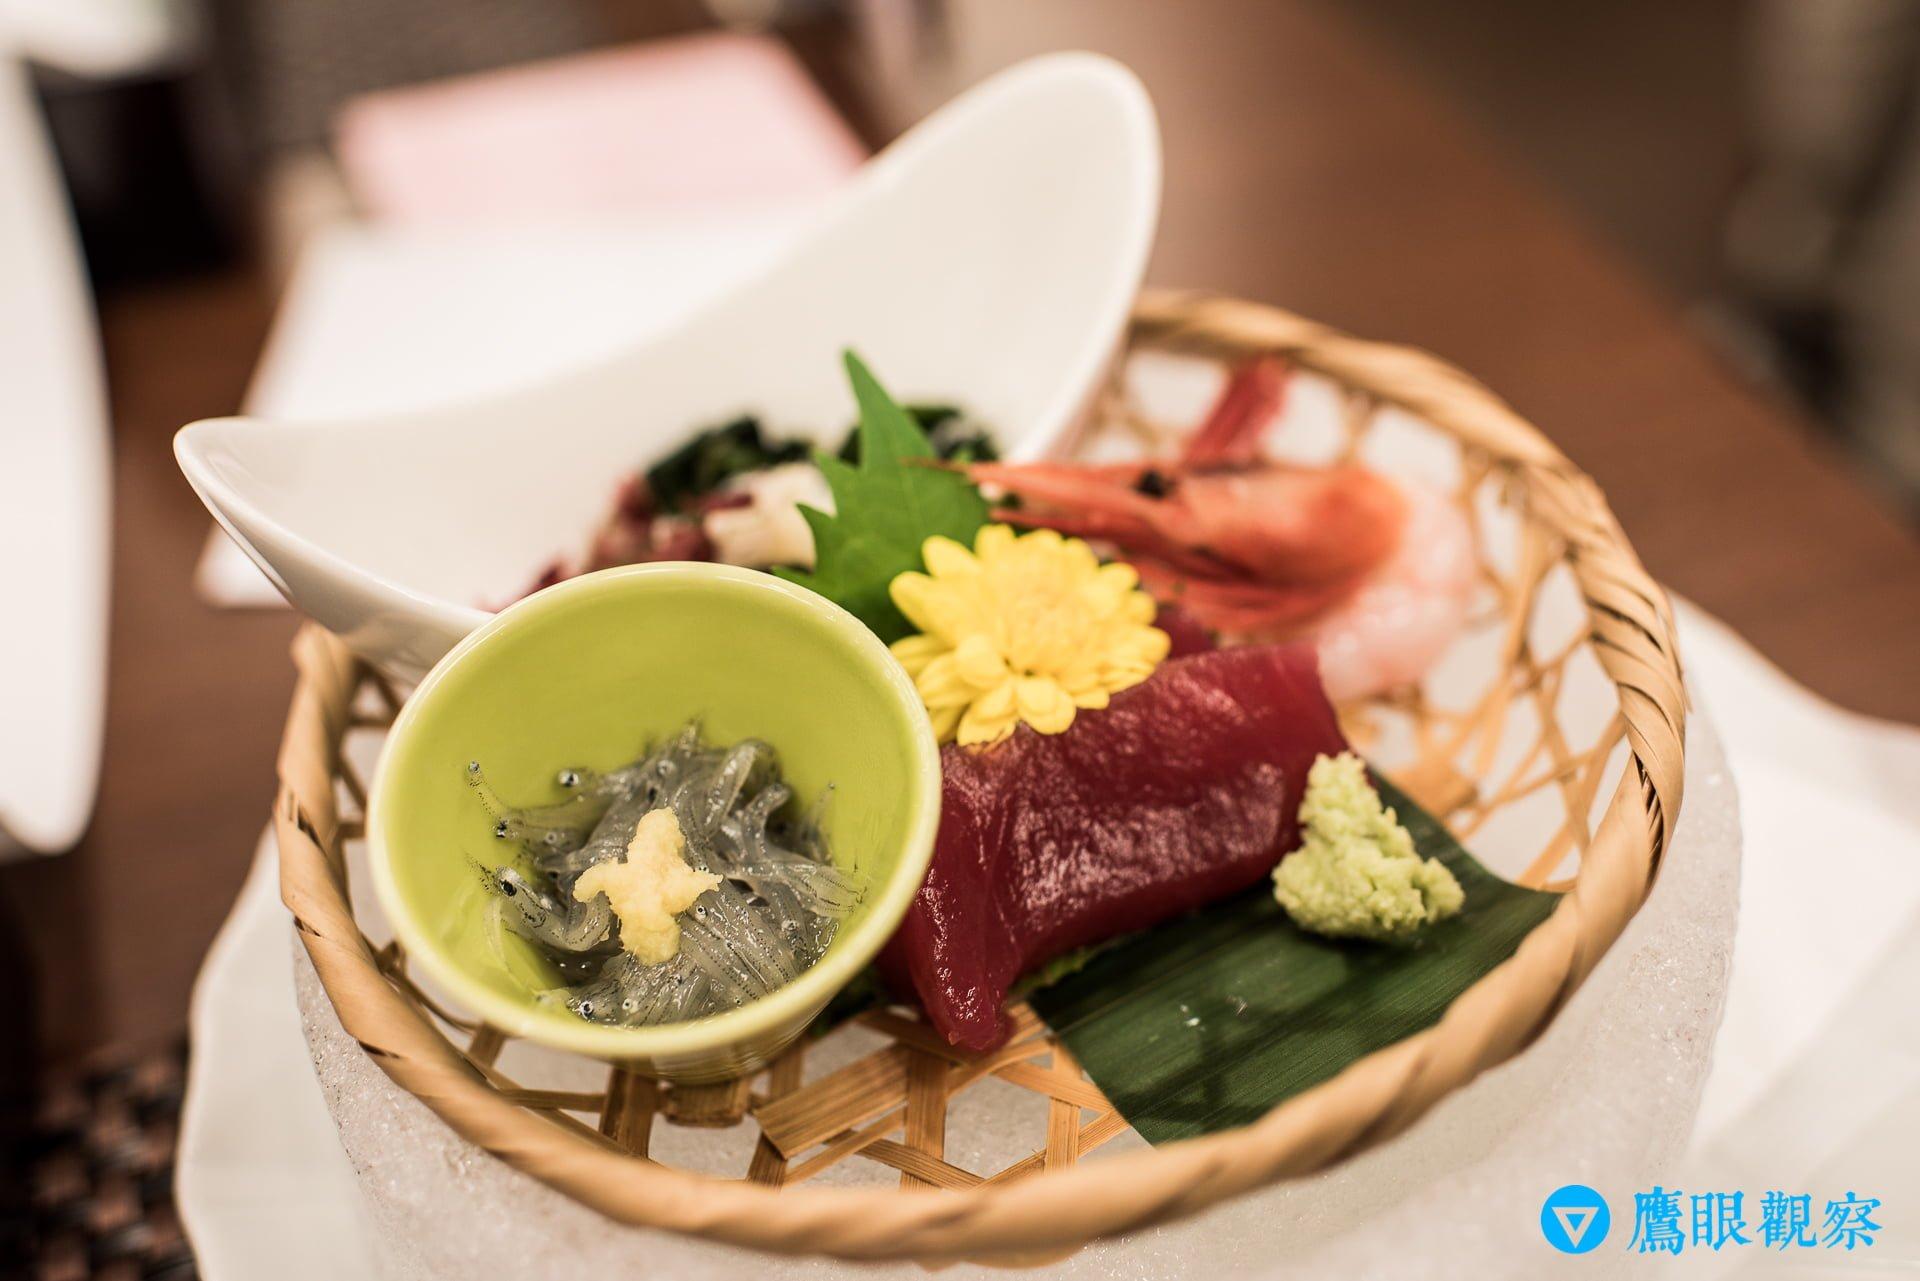 Travel Oarai Hotel in Ibaraki Prefecture Japan 16 日本茨城縣/東茨城/大洗飯店(大洗ホテル)/旅館推薦與住宿旅遊心得分享